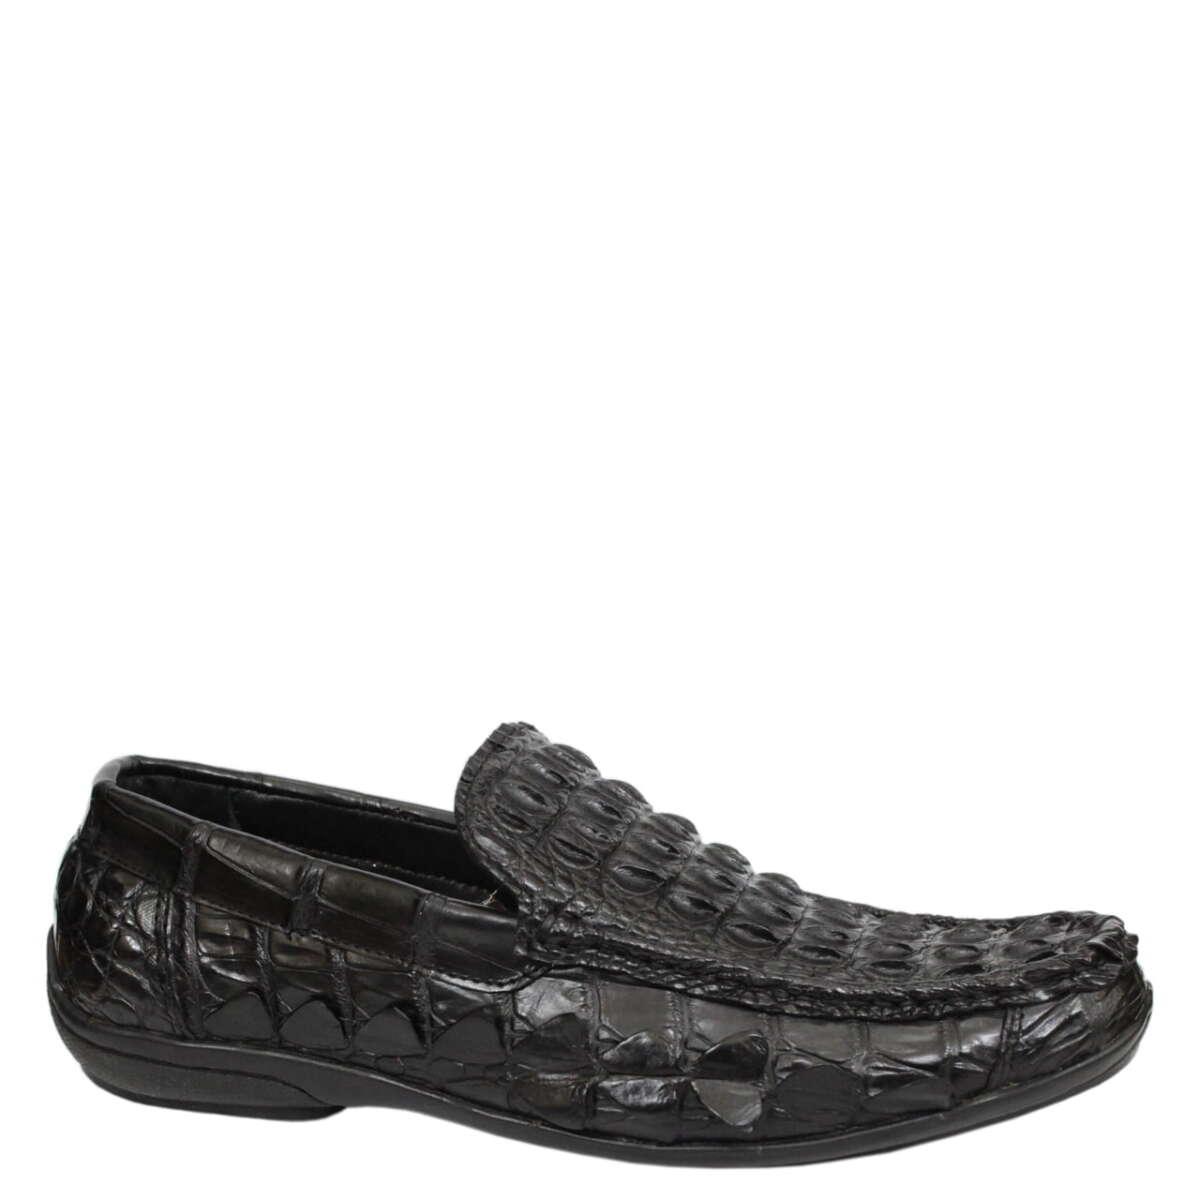 Giày lười nam da cá sấu S859a